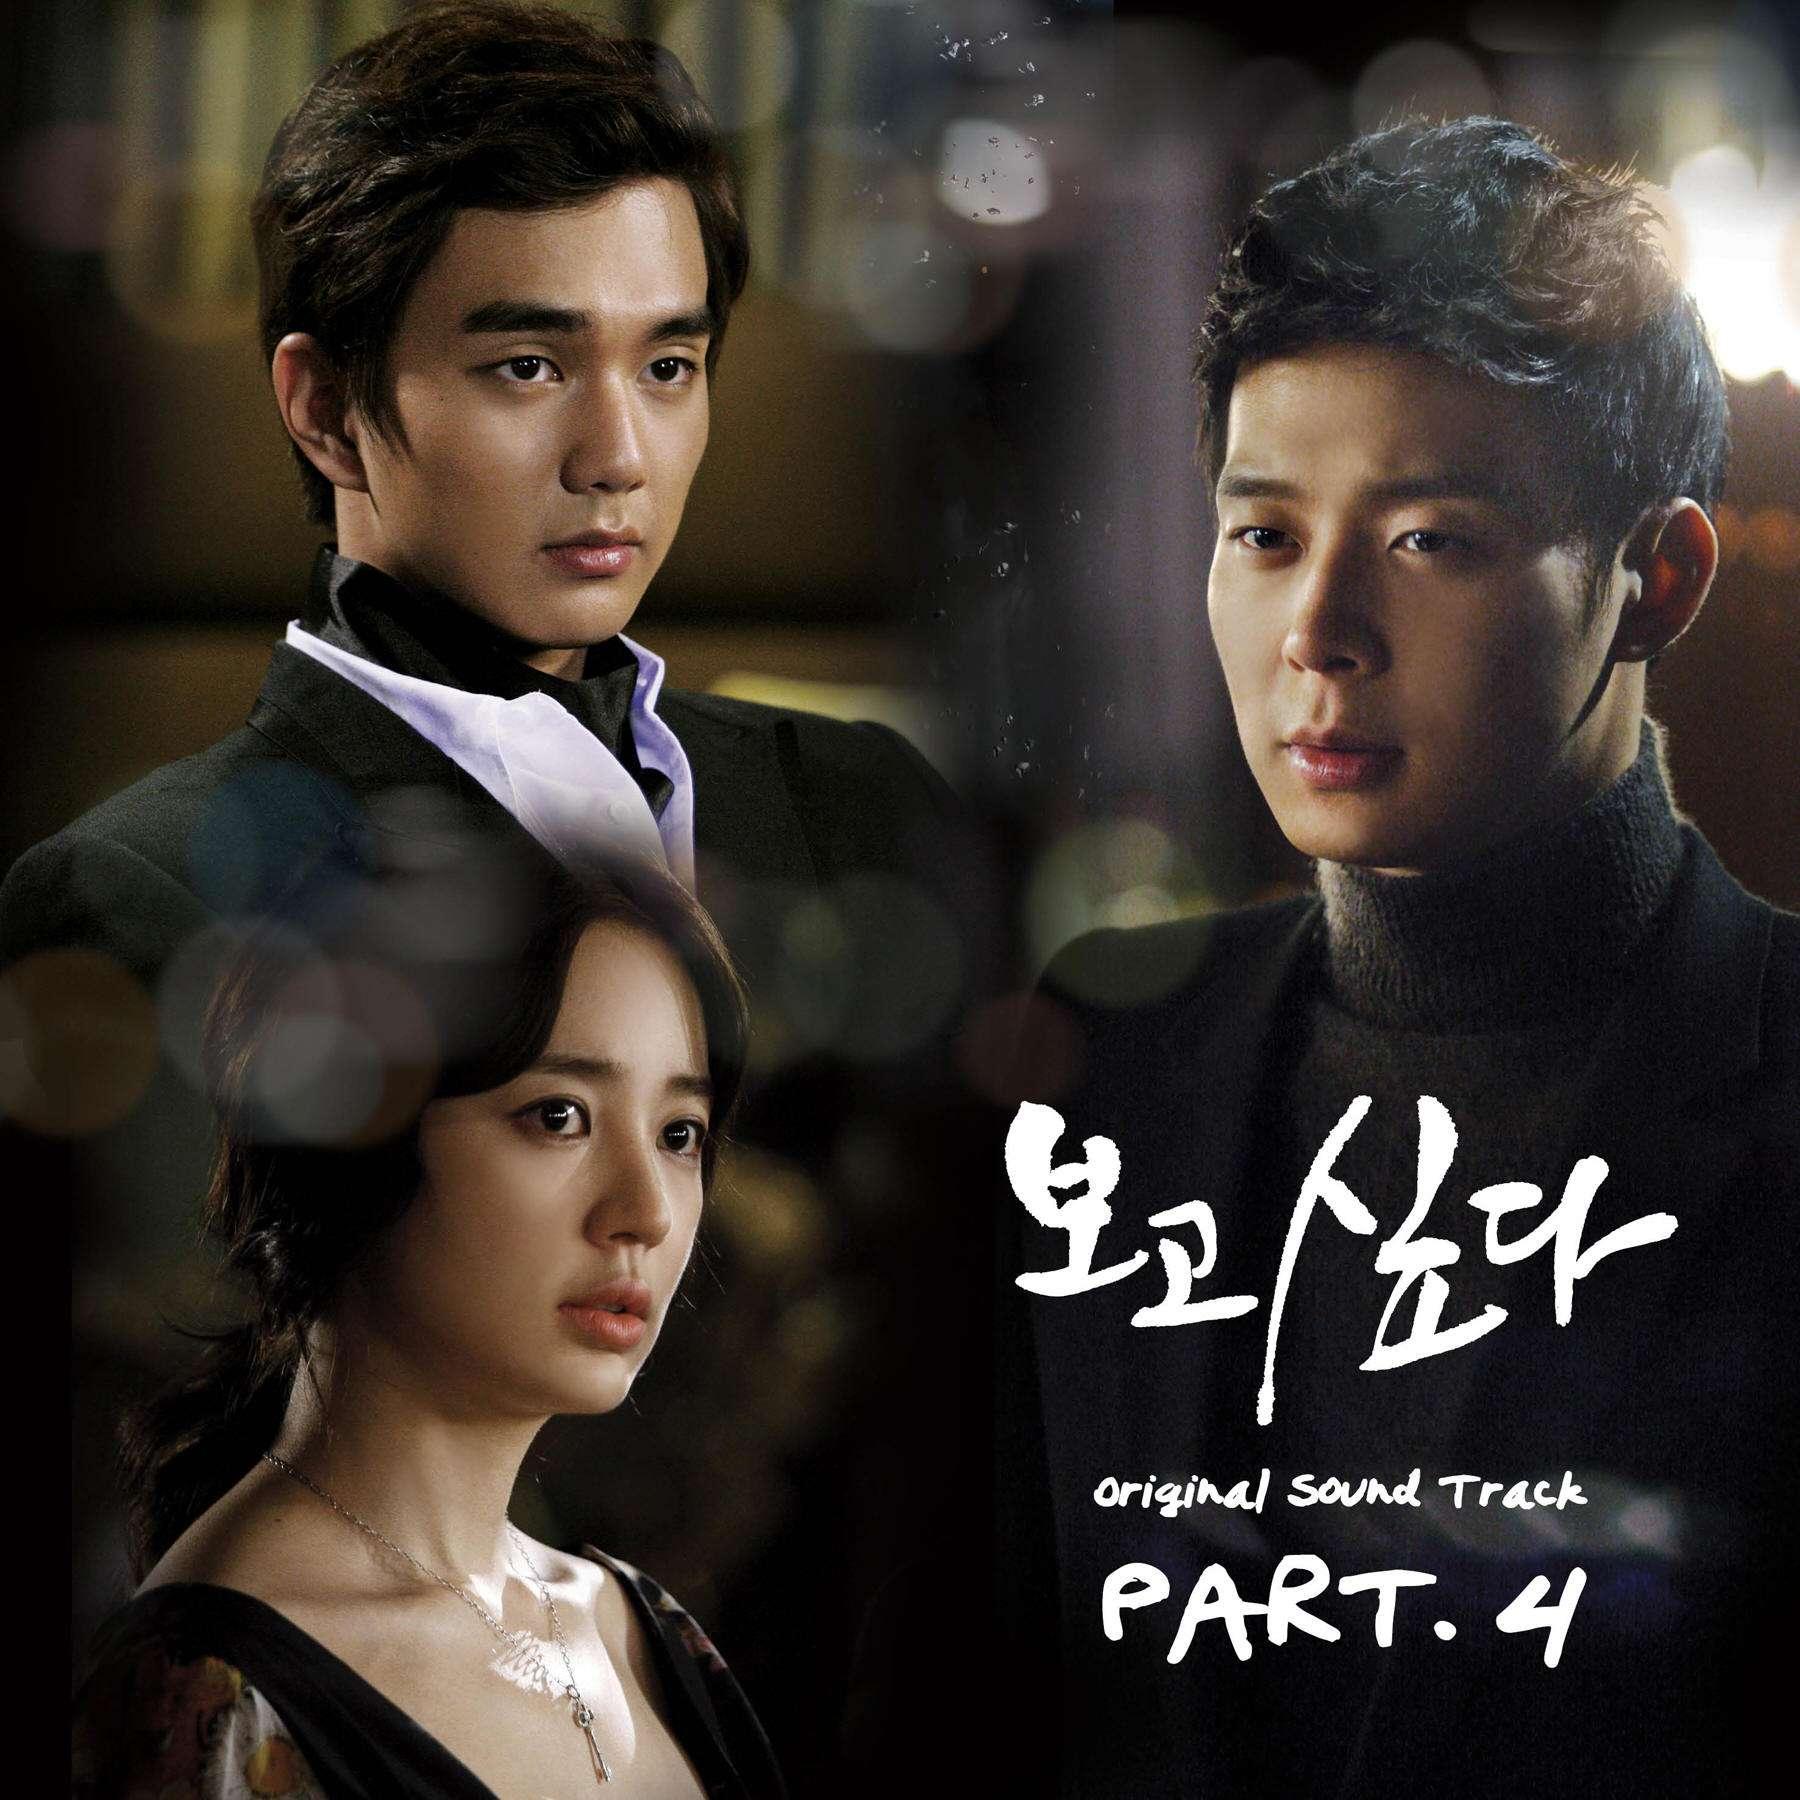 [Single] Lee Seok Hoon - I Miss You OST Part.4